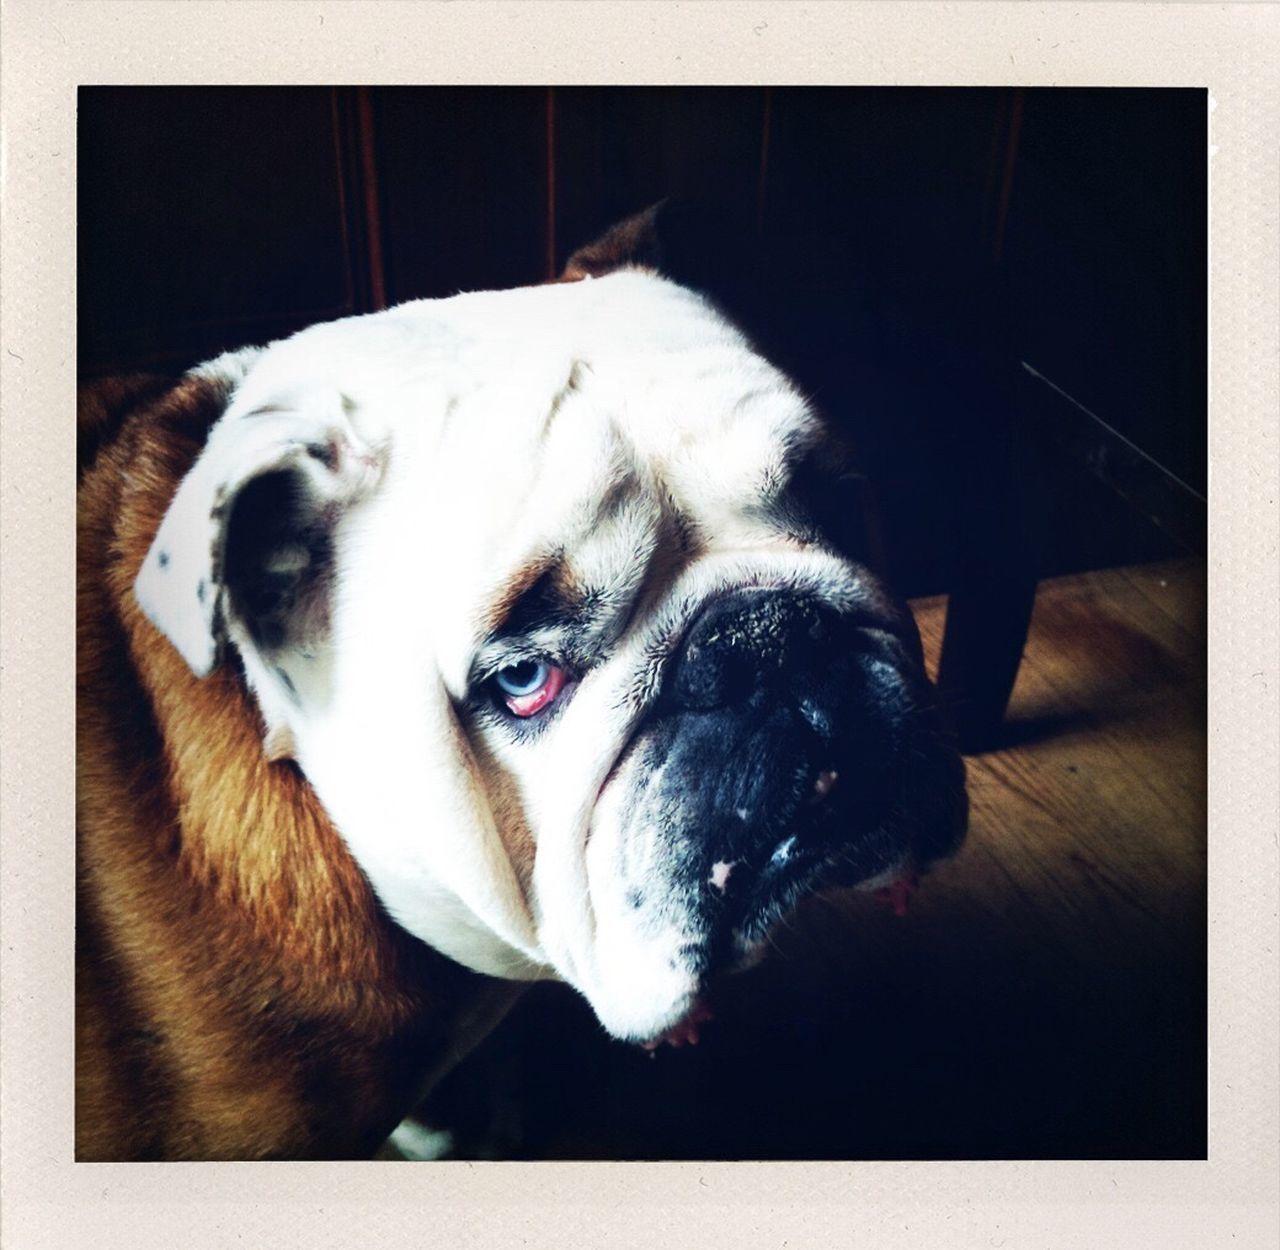 Close-Up Portrait Of British Bulldog At Home